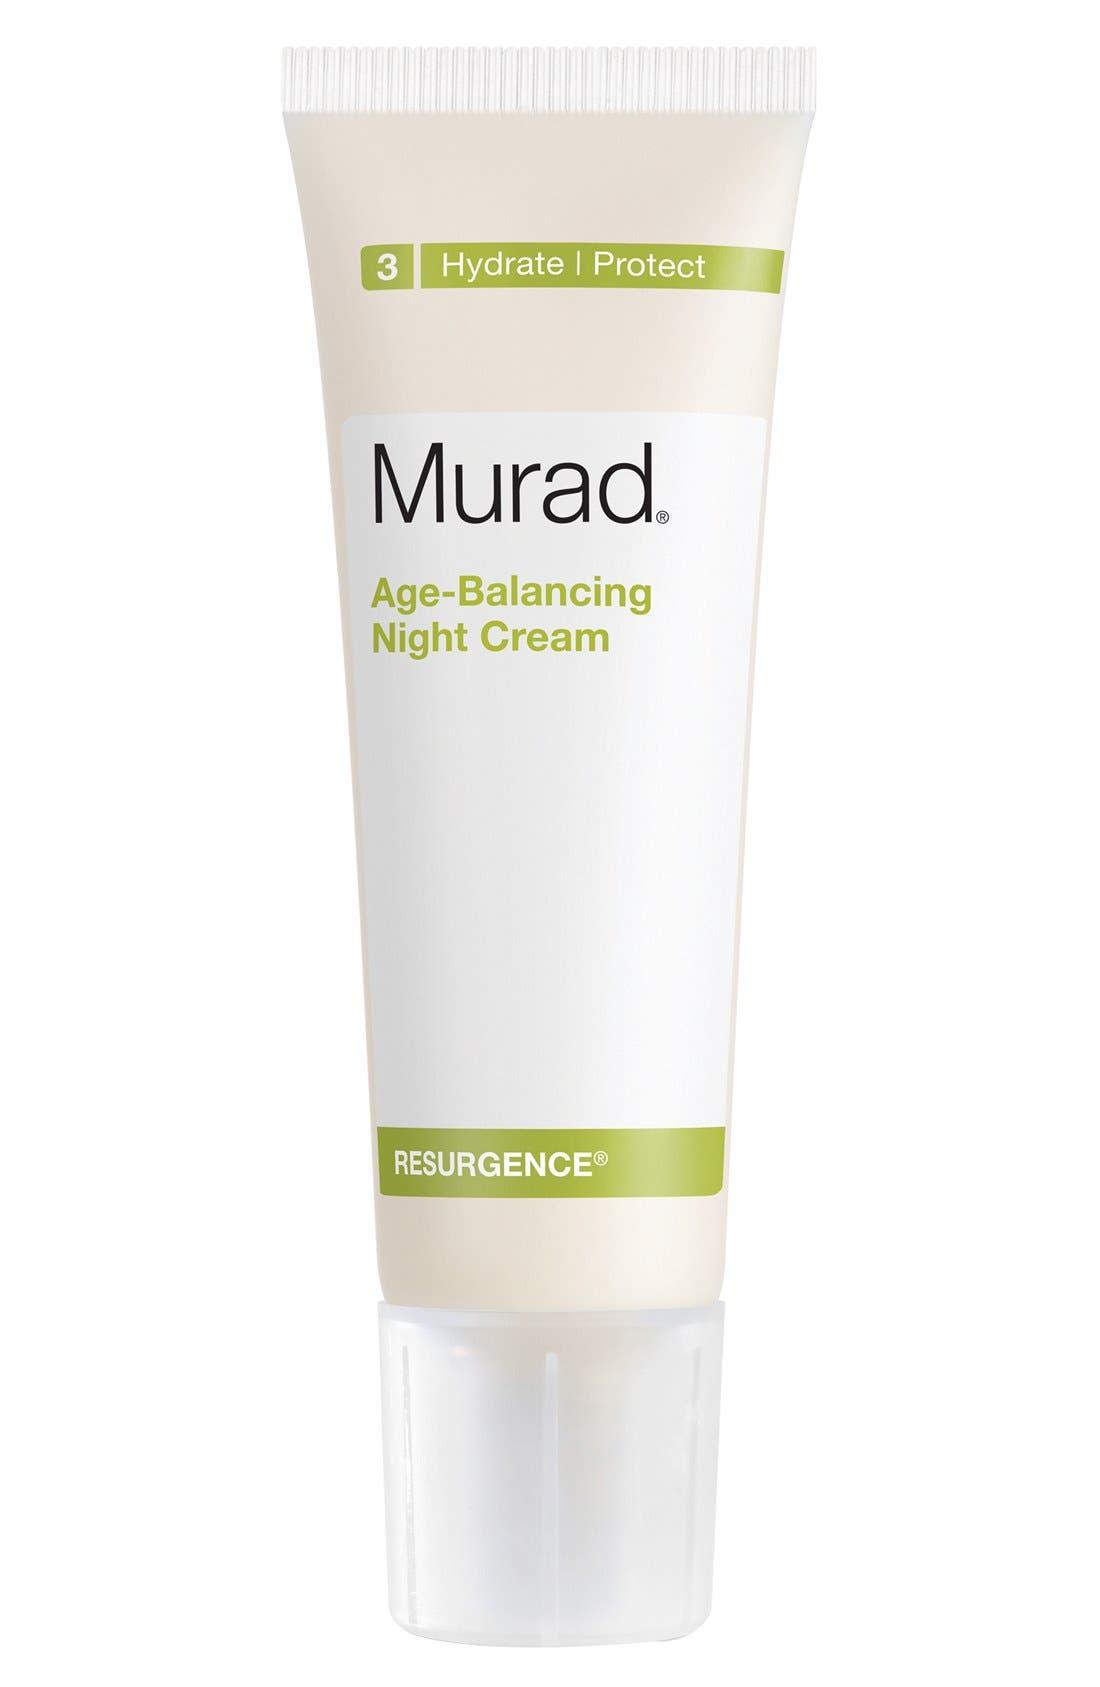 Murad® Age-Balancing Night Cream